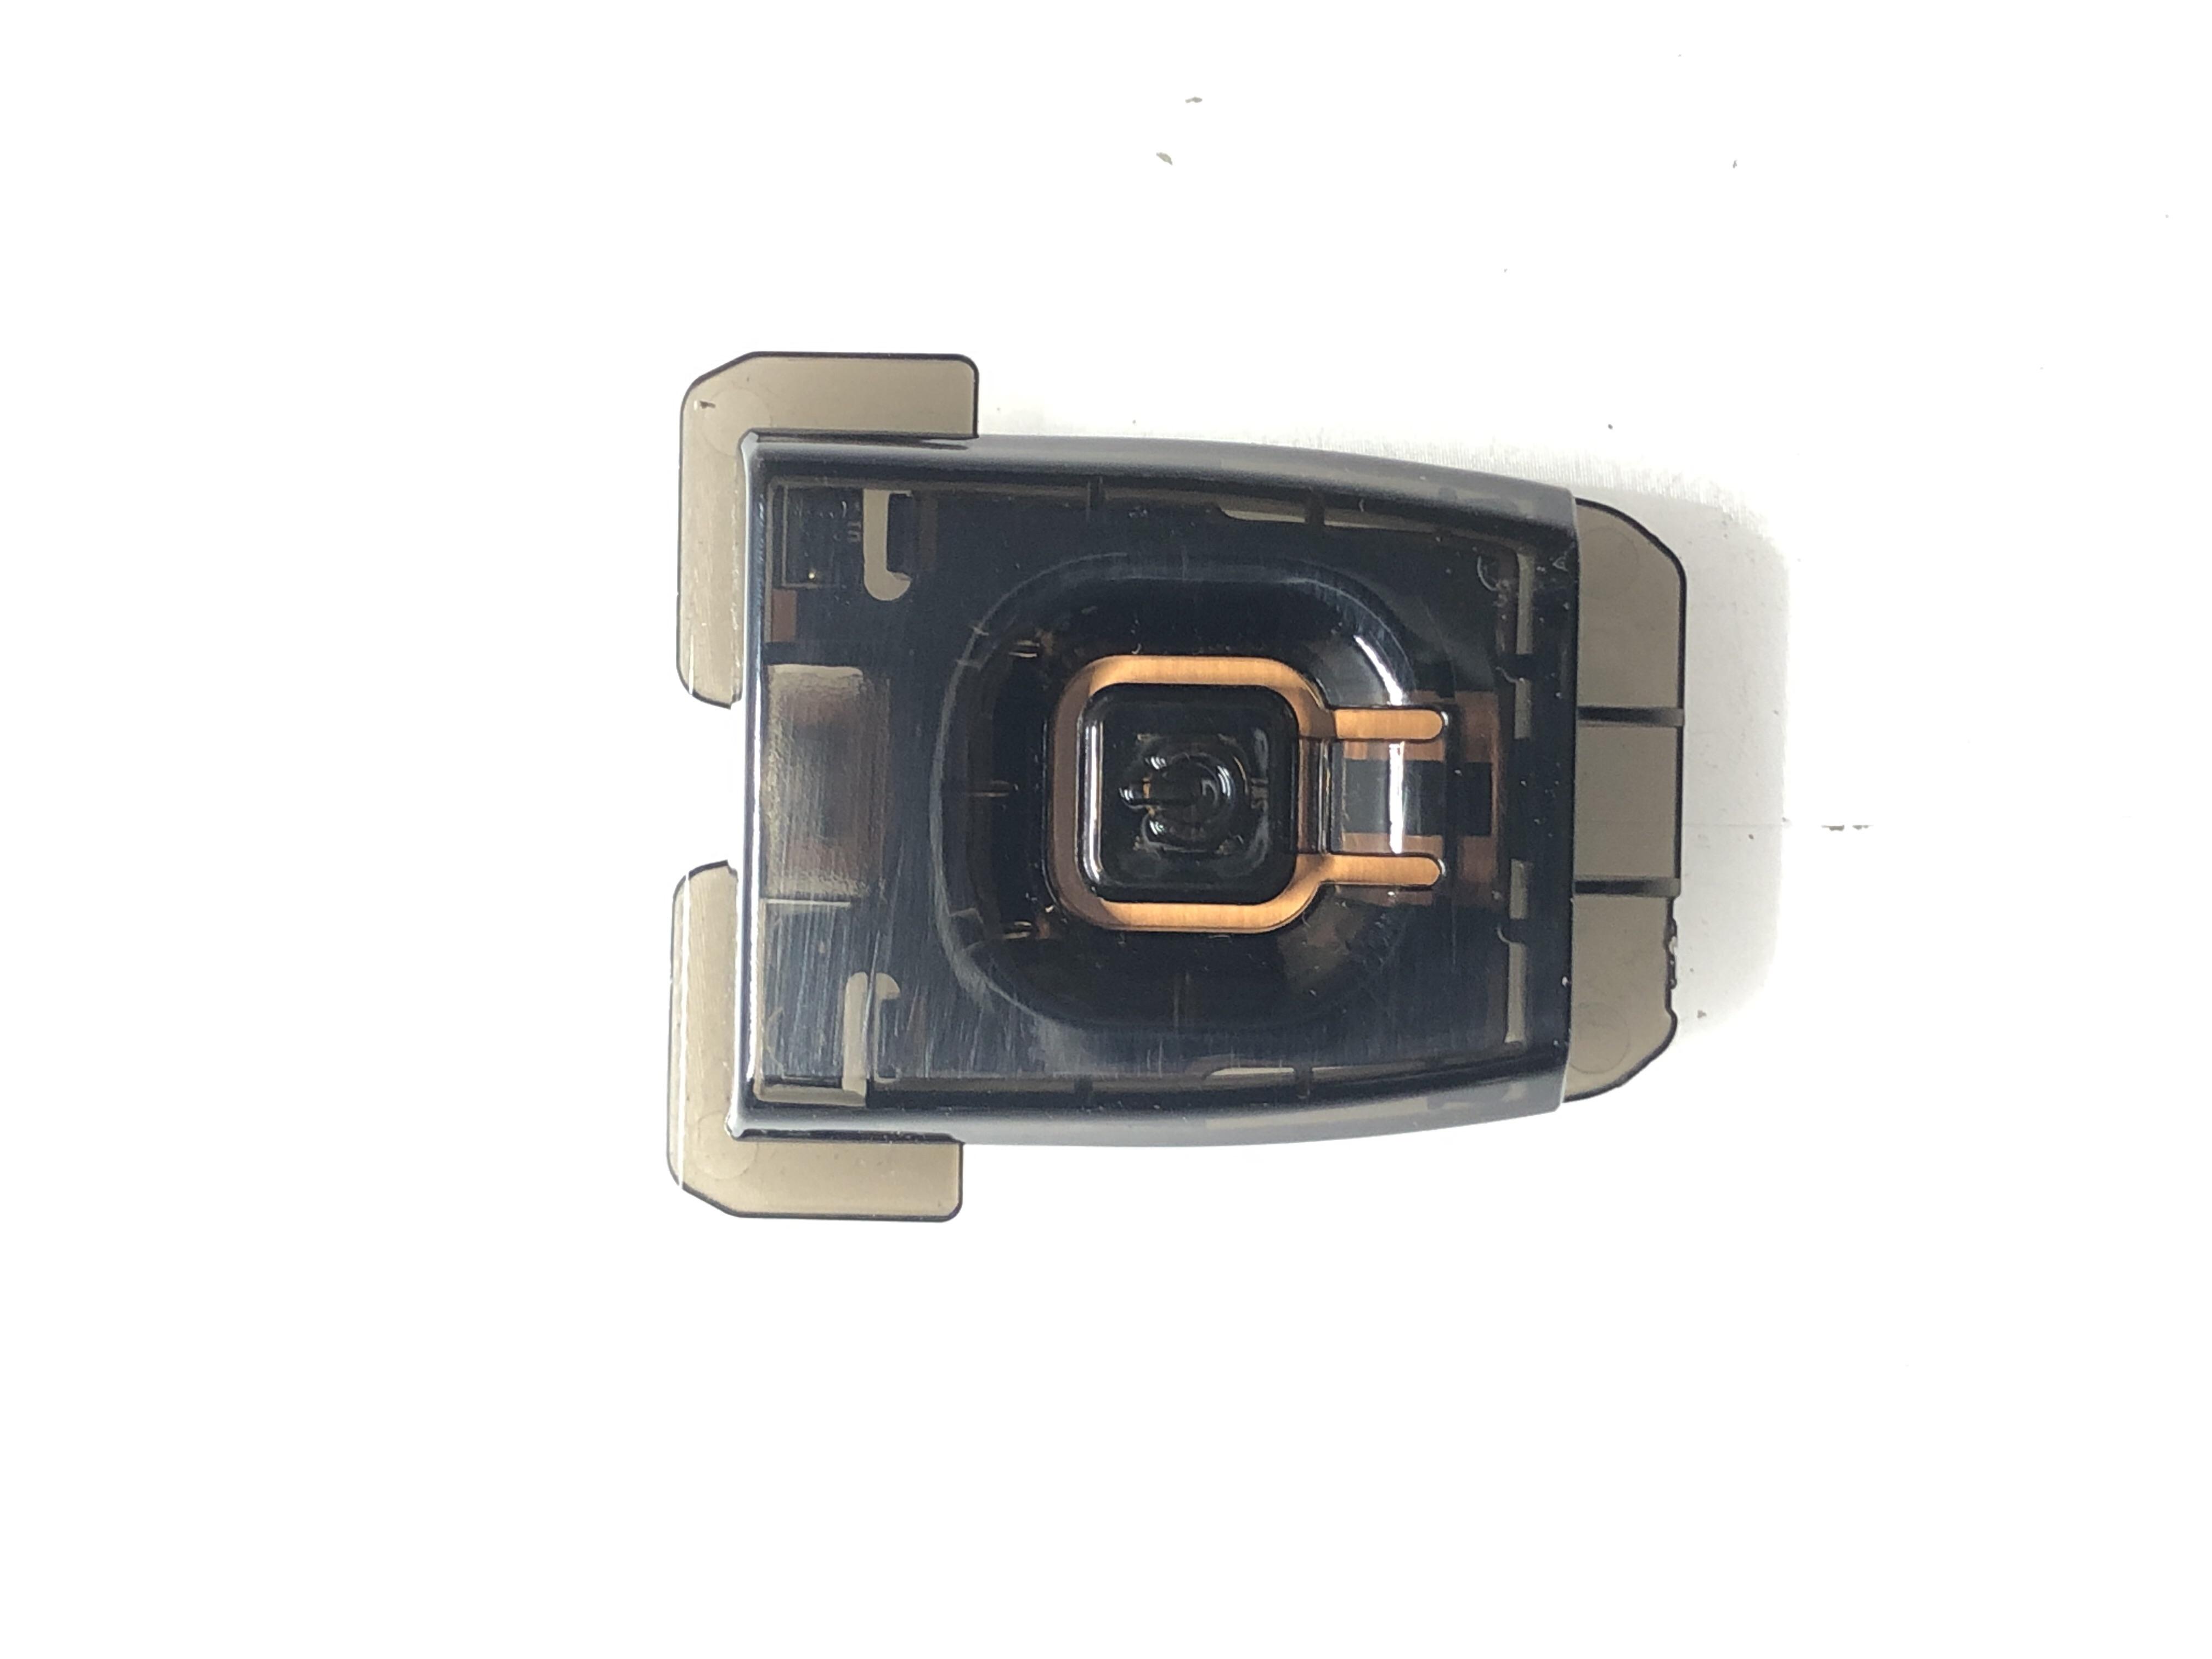 Ebr83592701 Ir Remote Control Sensor For Lg 43lk5900plabekwljp Checking Button Unit 65uk6300plbbekgljp